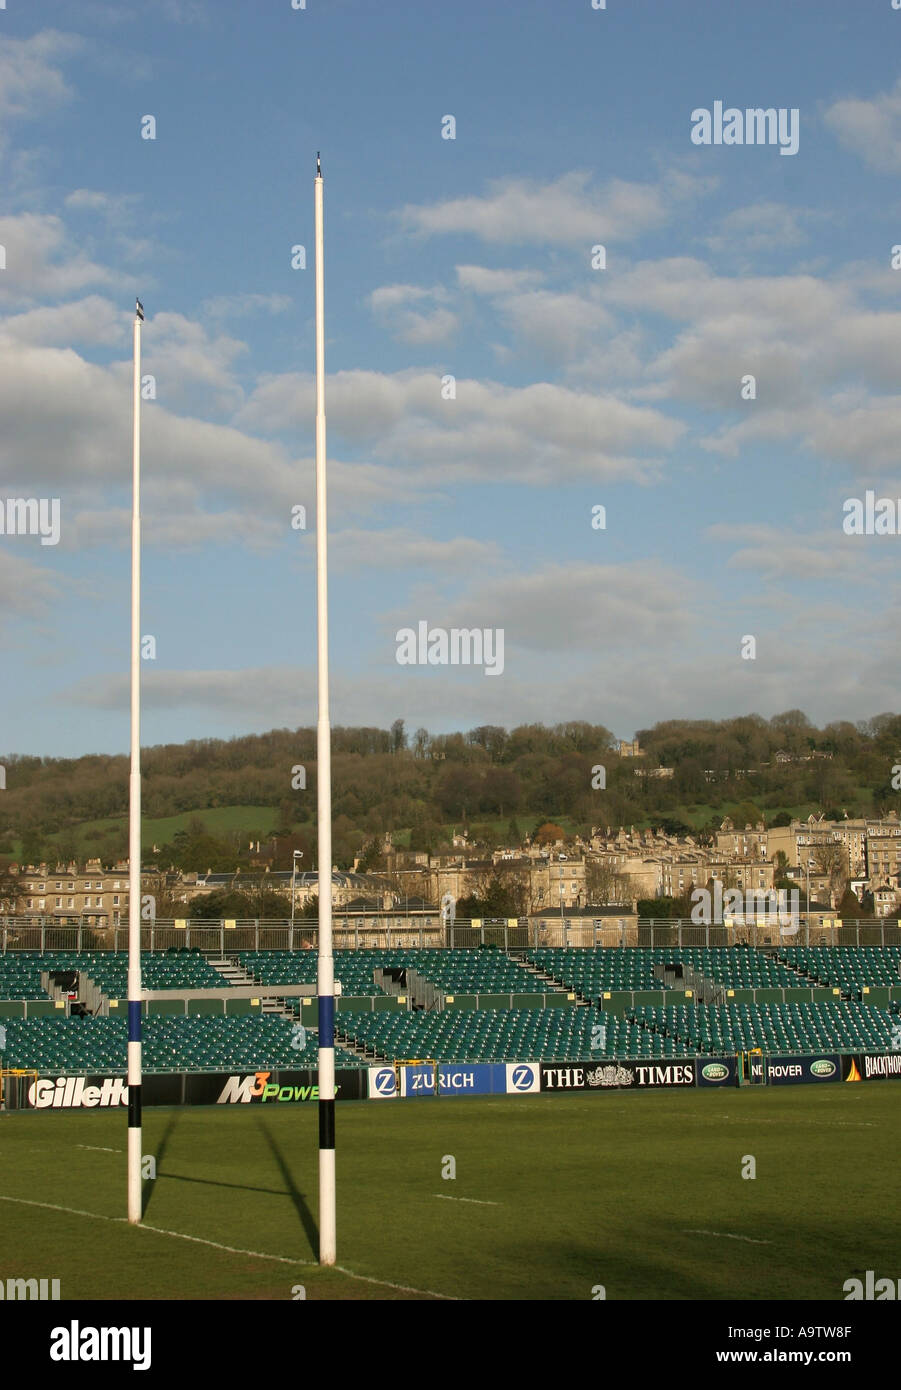 Bath Rugby Football Club at Bath England UK 2005 Stock Photo ...